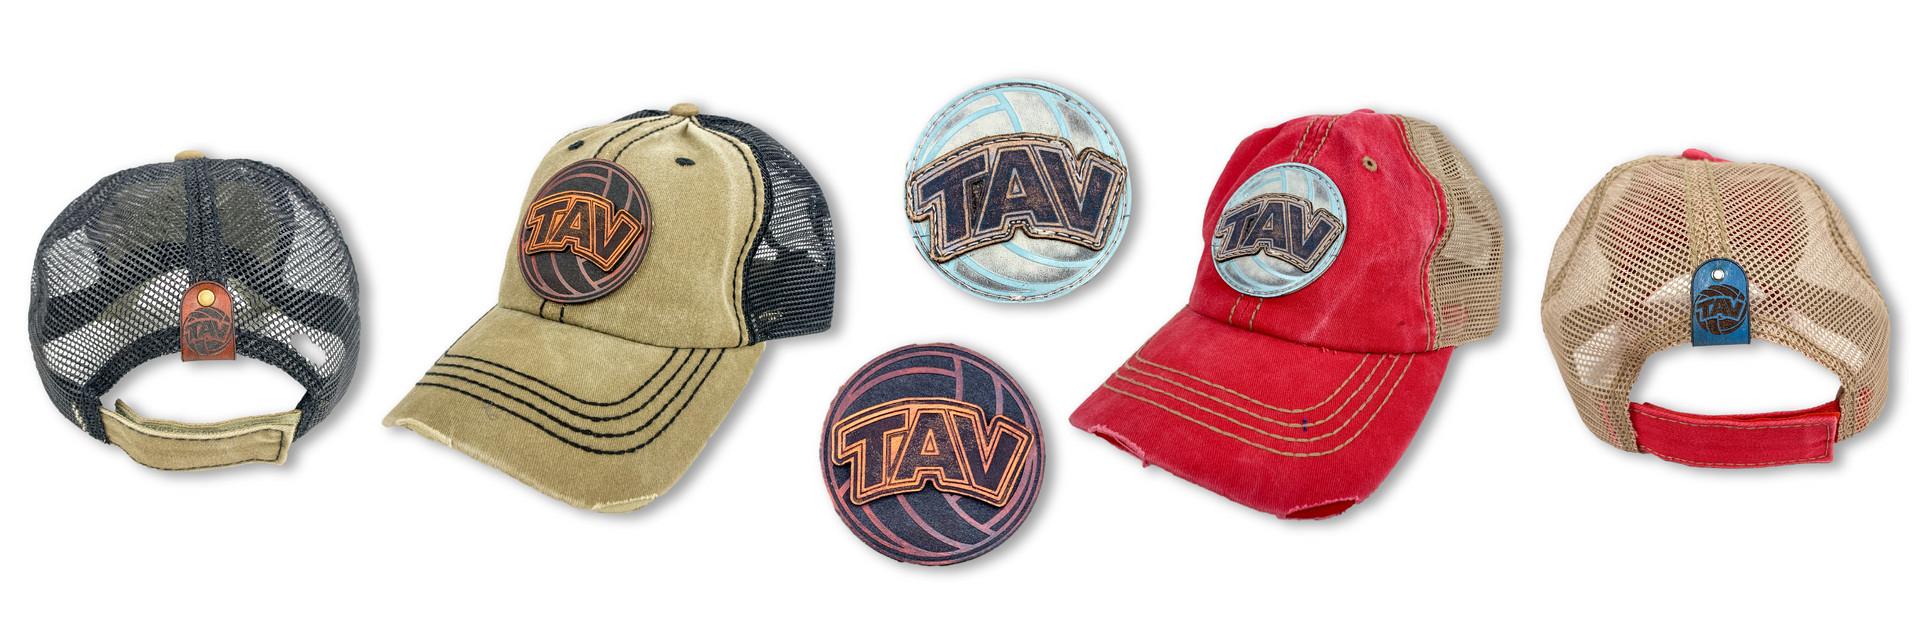 CUSTOM LEATHER PATCH HATS | TAV VOLLEYBALL CLUB